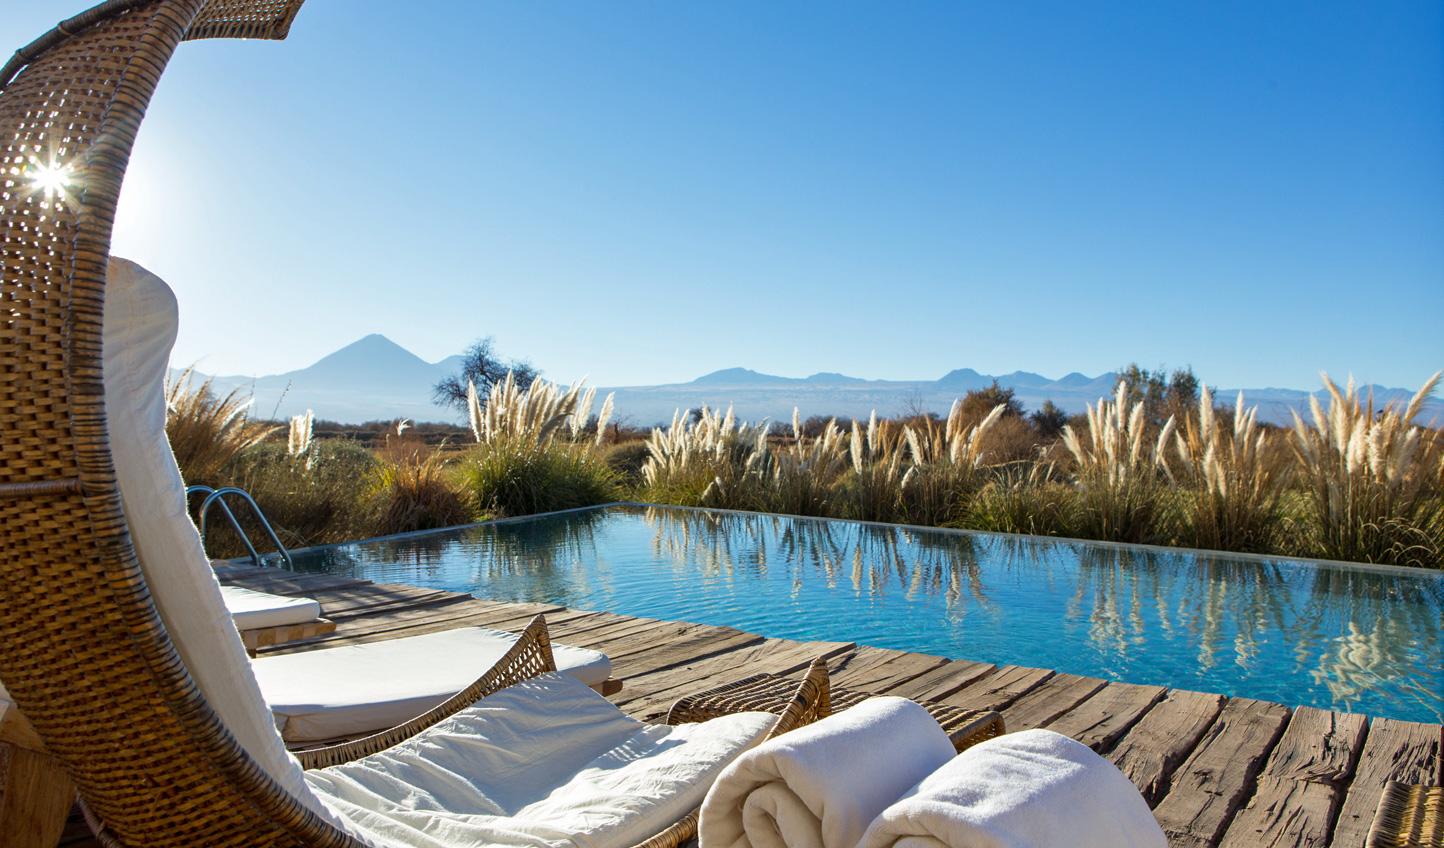 Kick back at Tierra Atacama and soak in the endless views